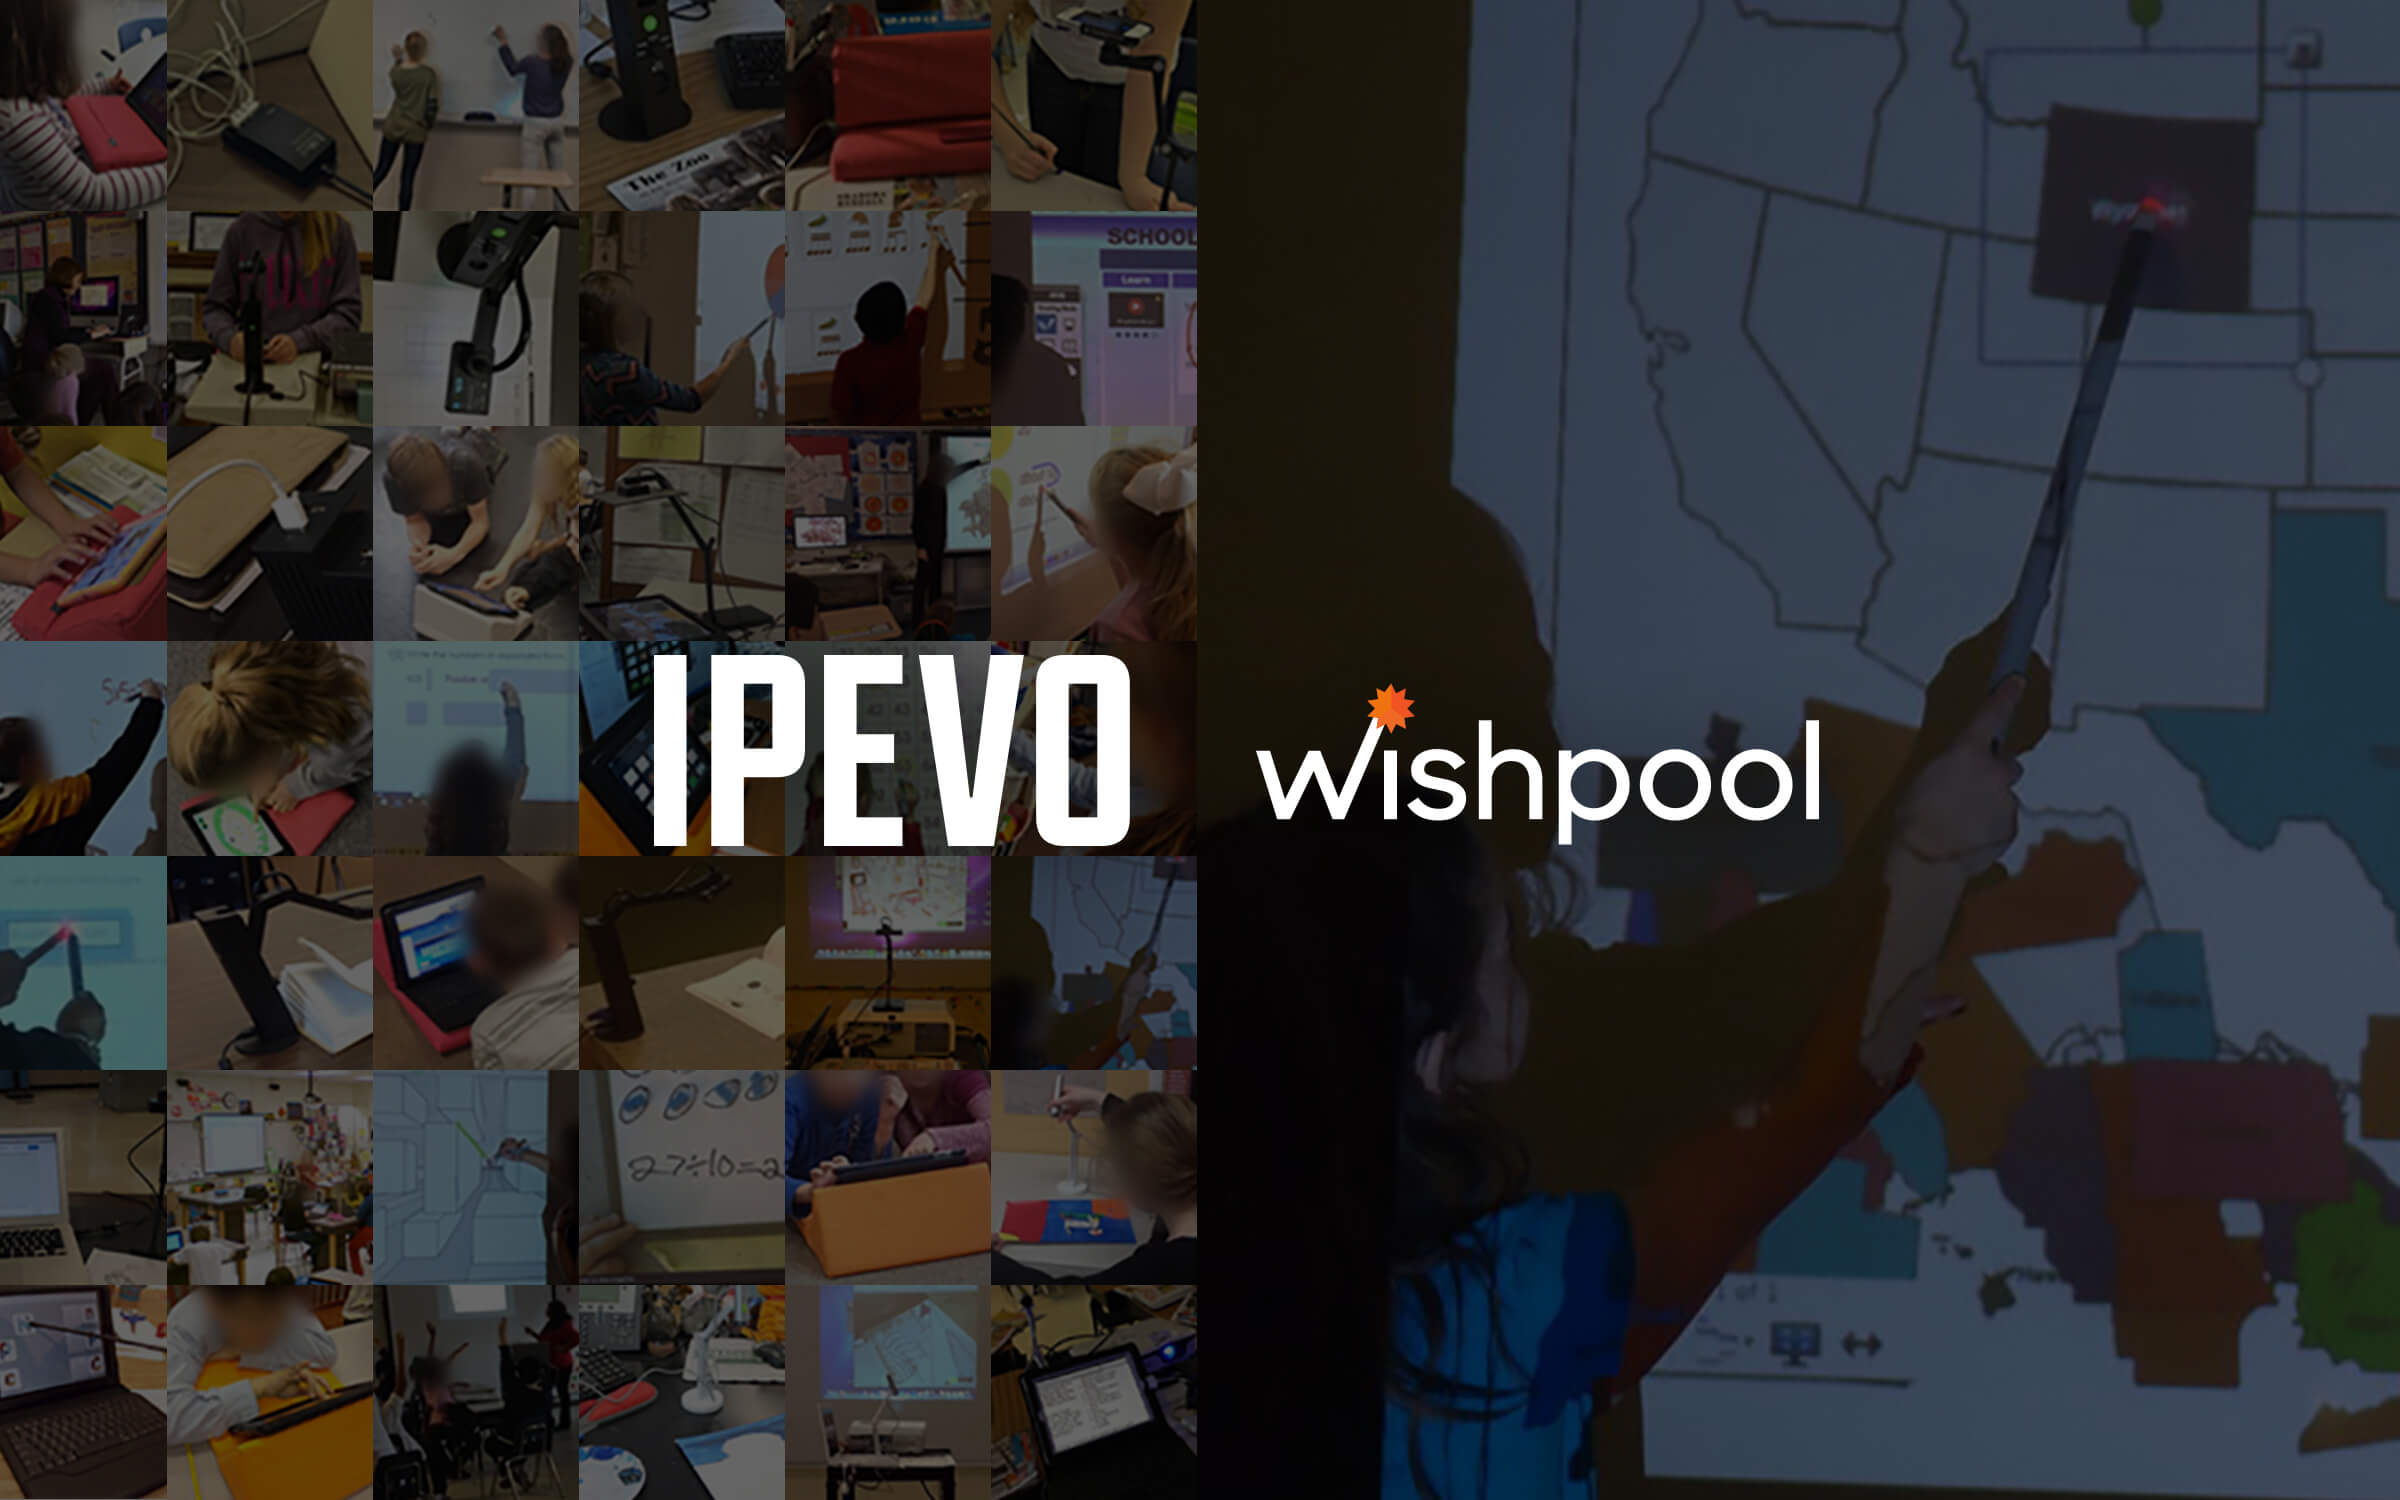 IPEVO Wishpool